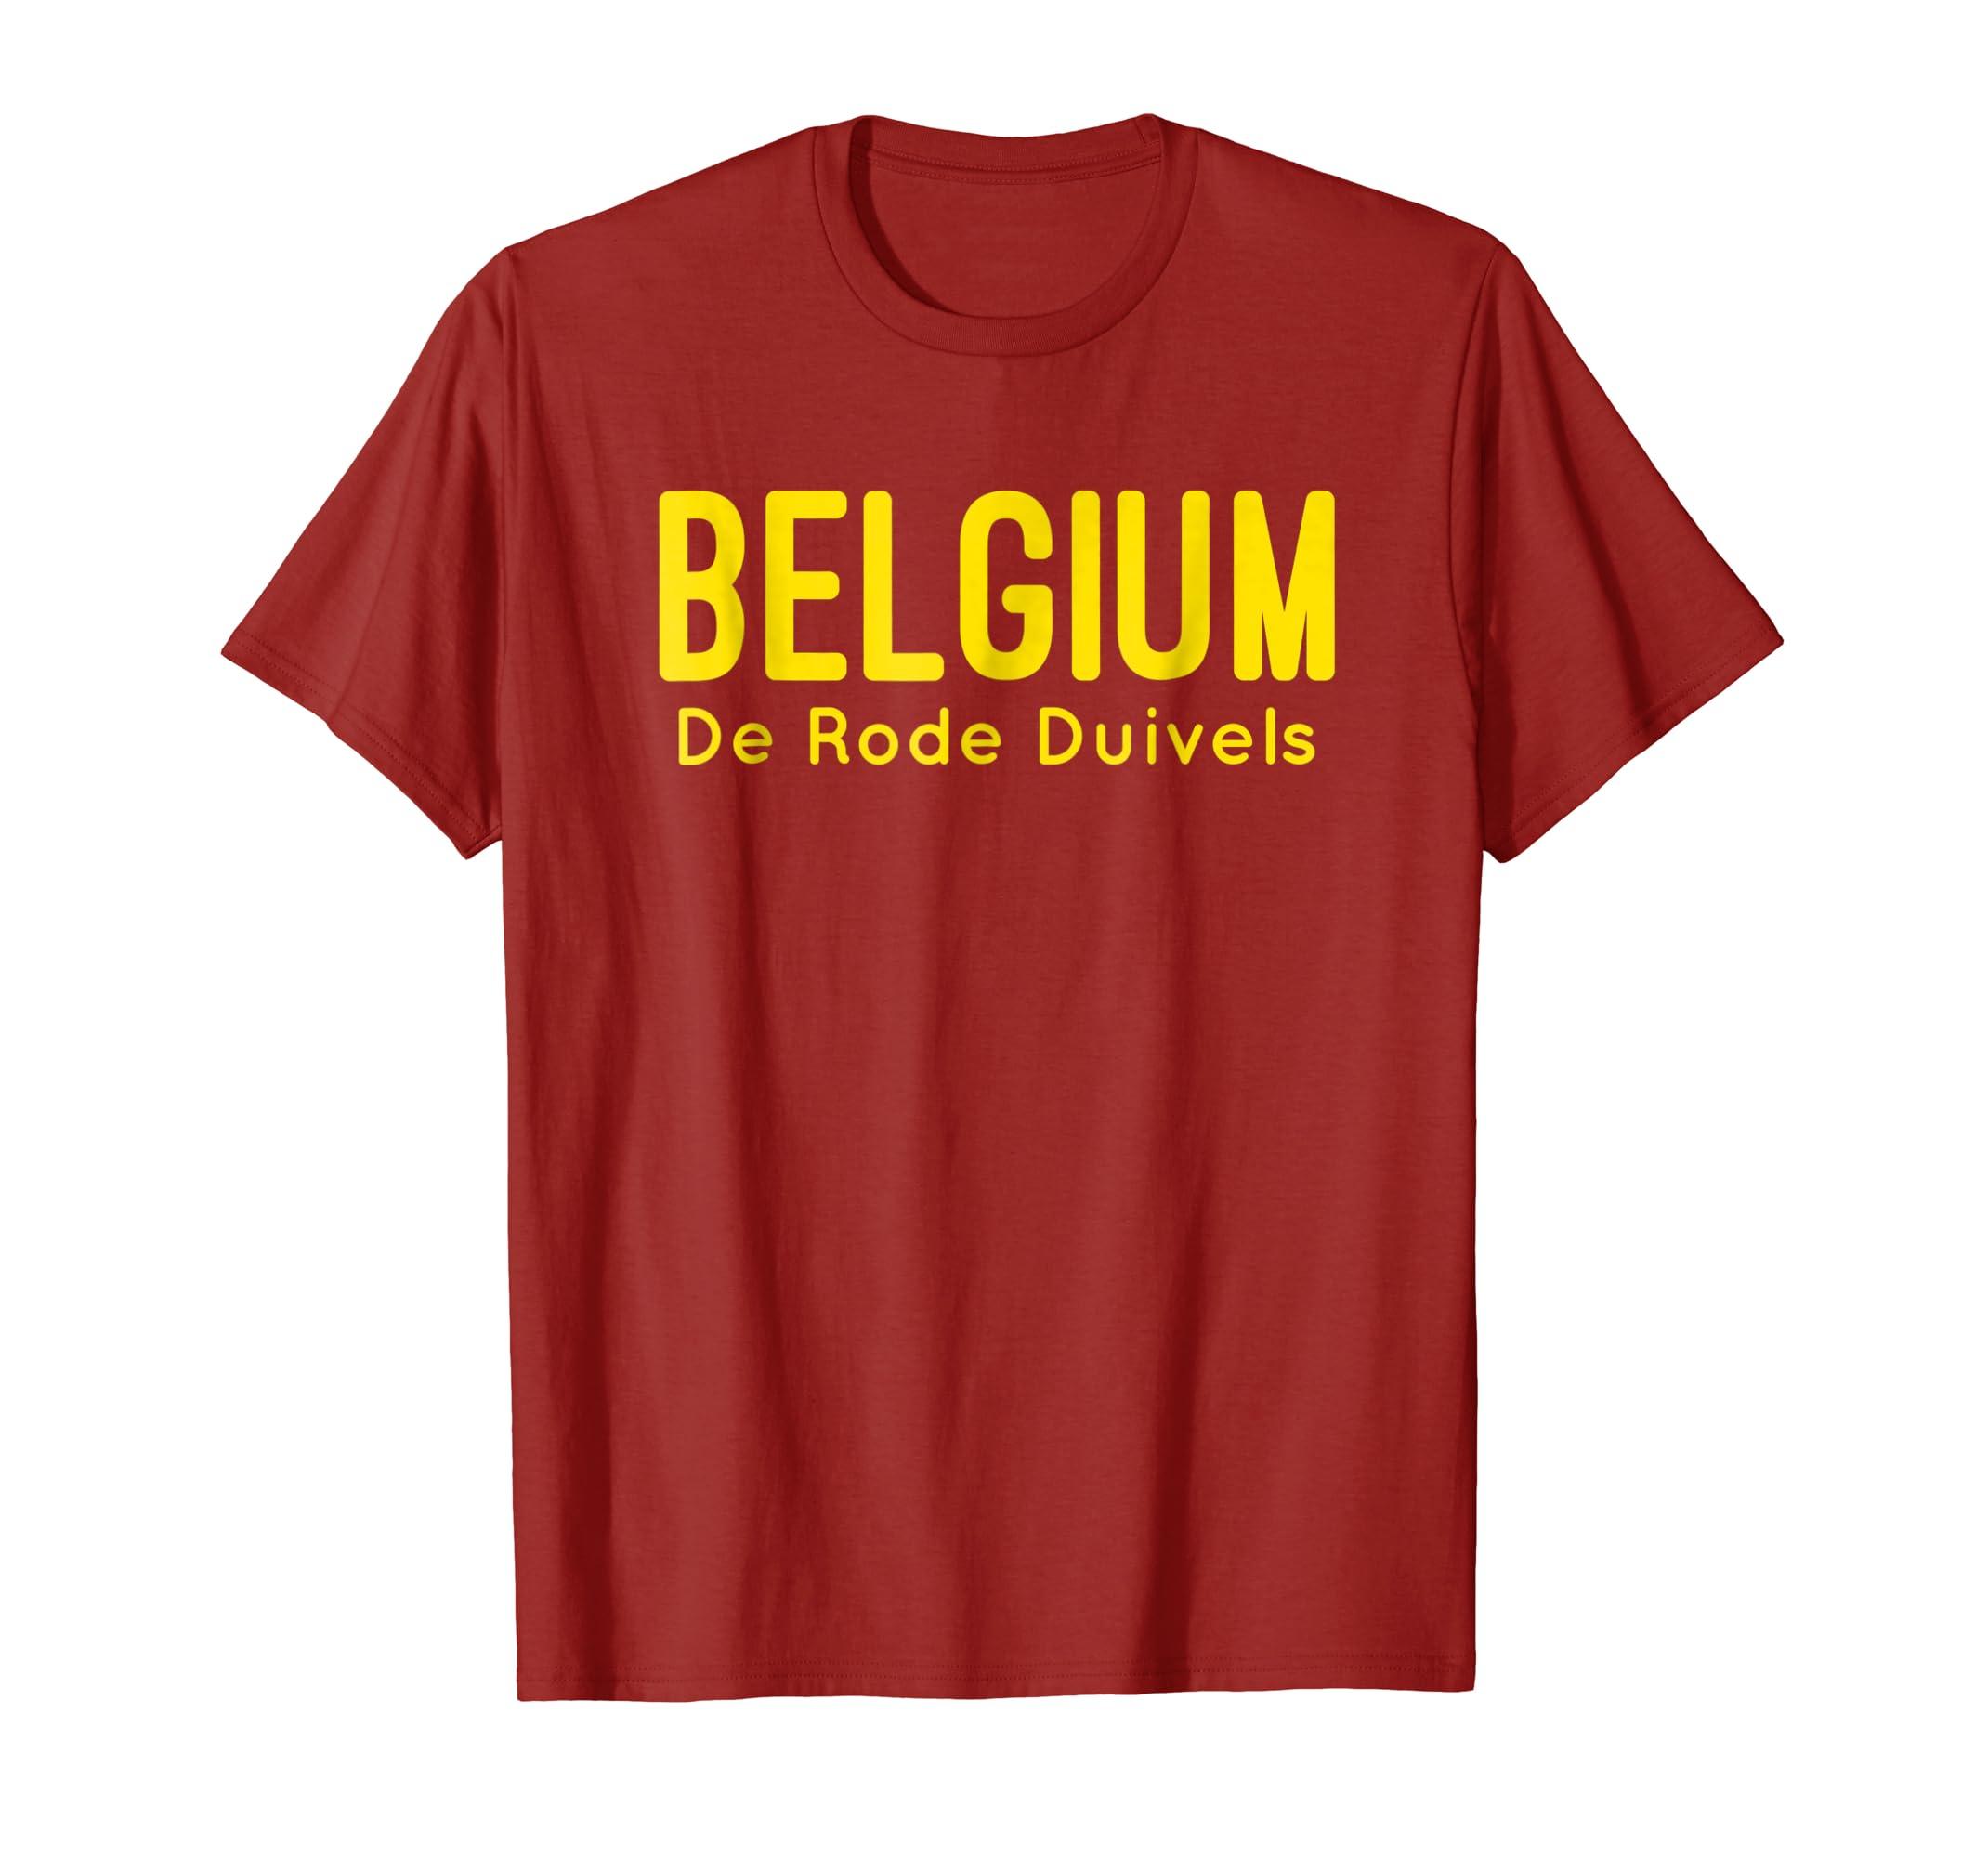 Amazon.com  Belgium T-Shirt Belgian Soccer Football Fan Jersey 2018   Clothing 14c63fd77